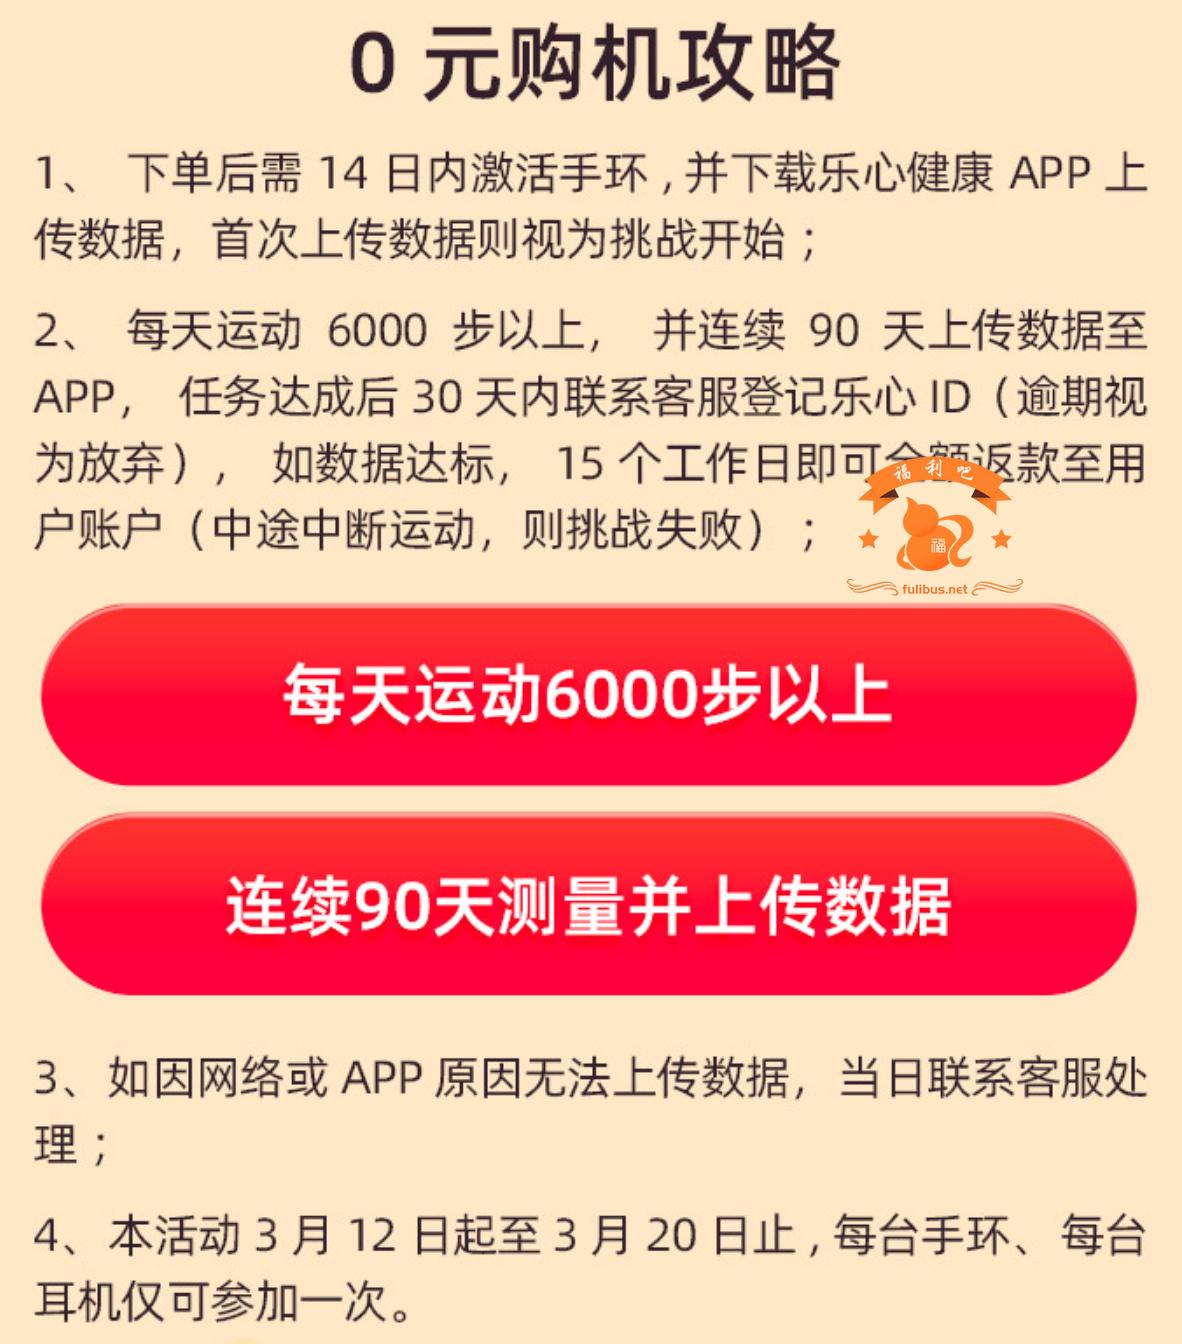 fulibus.net福利吧2020-03-17_02